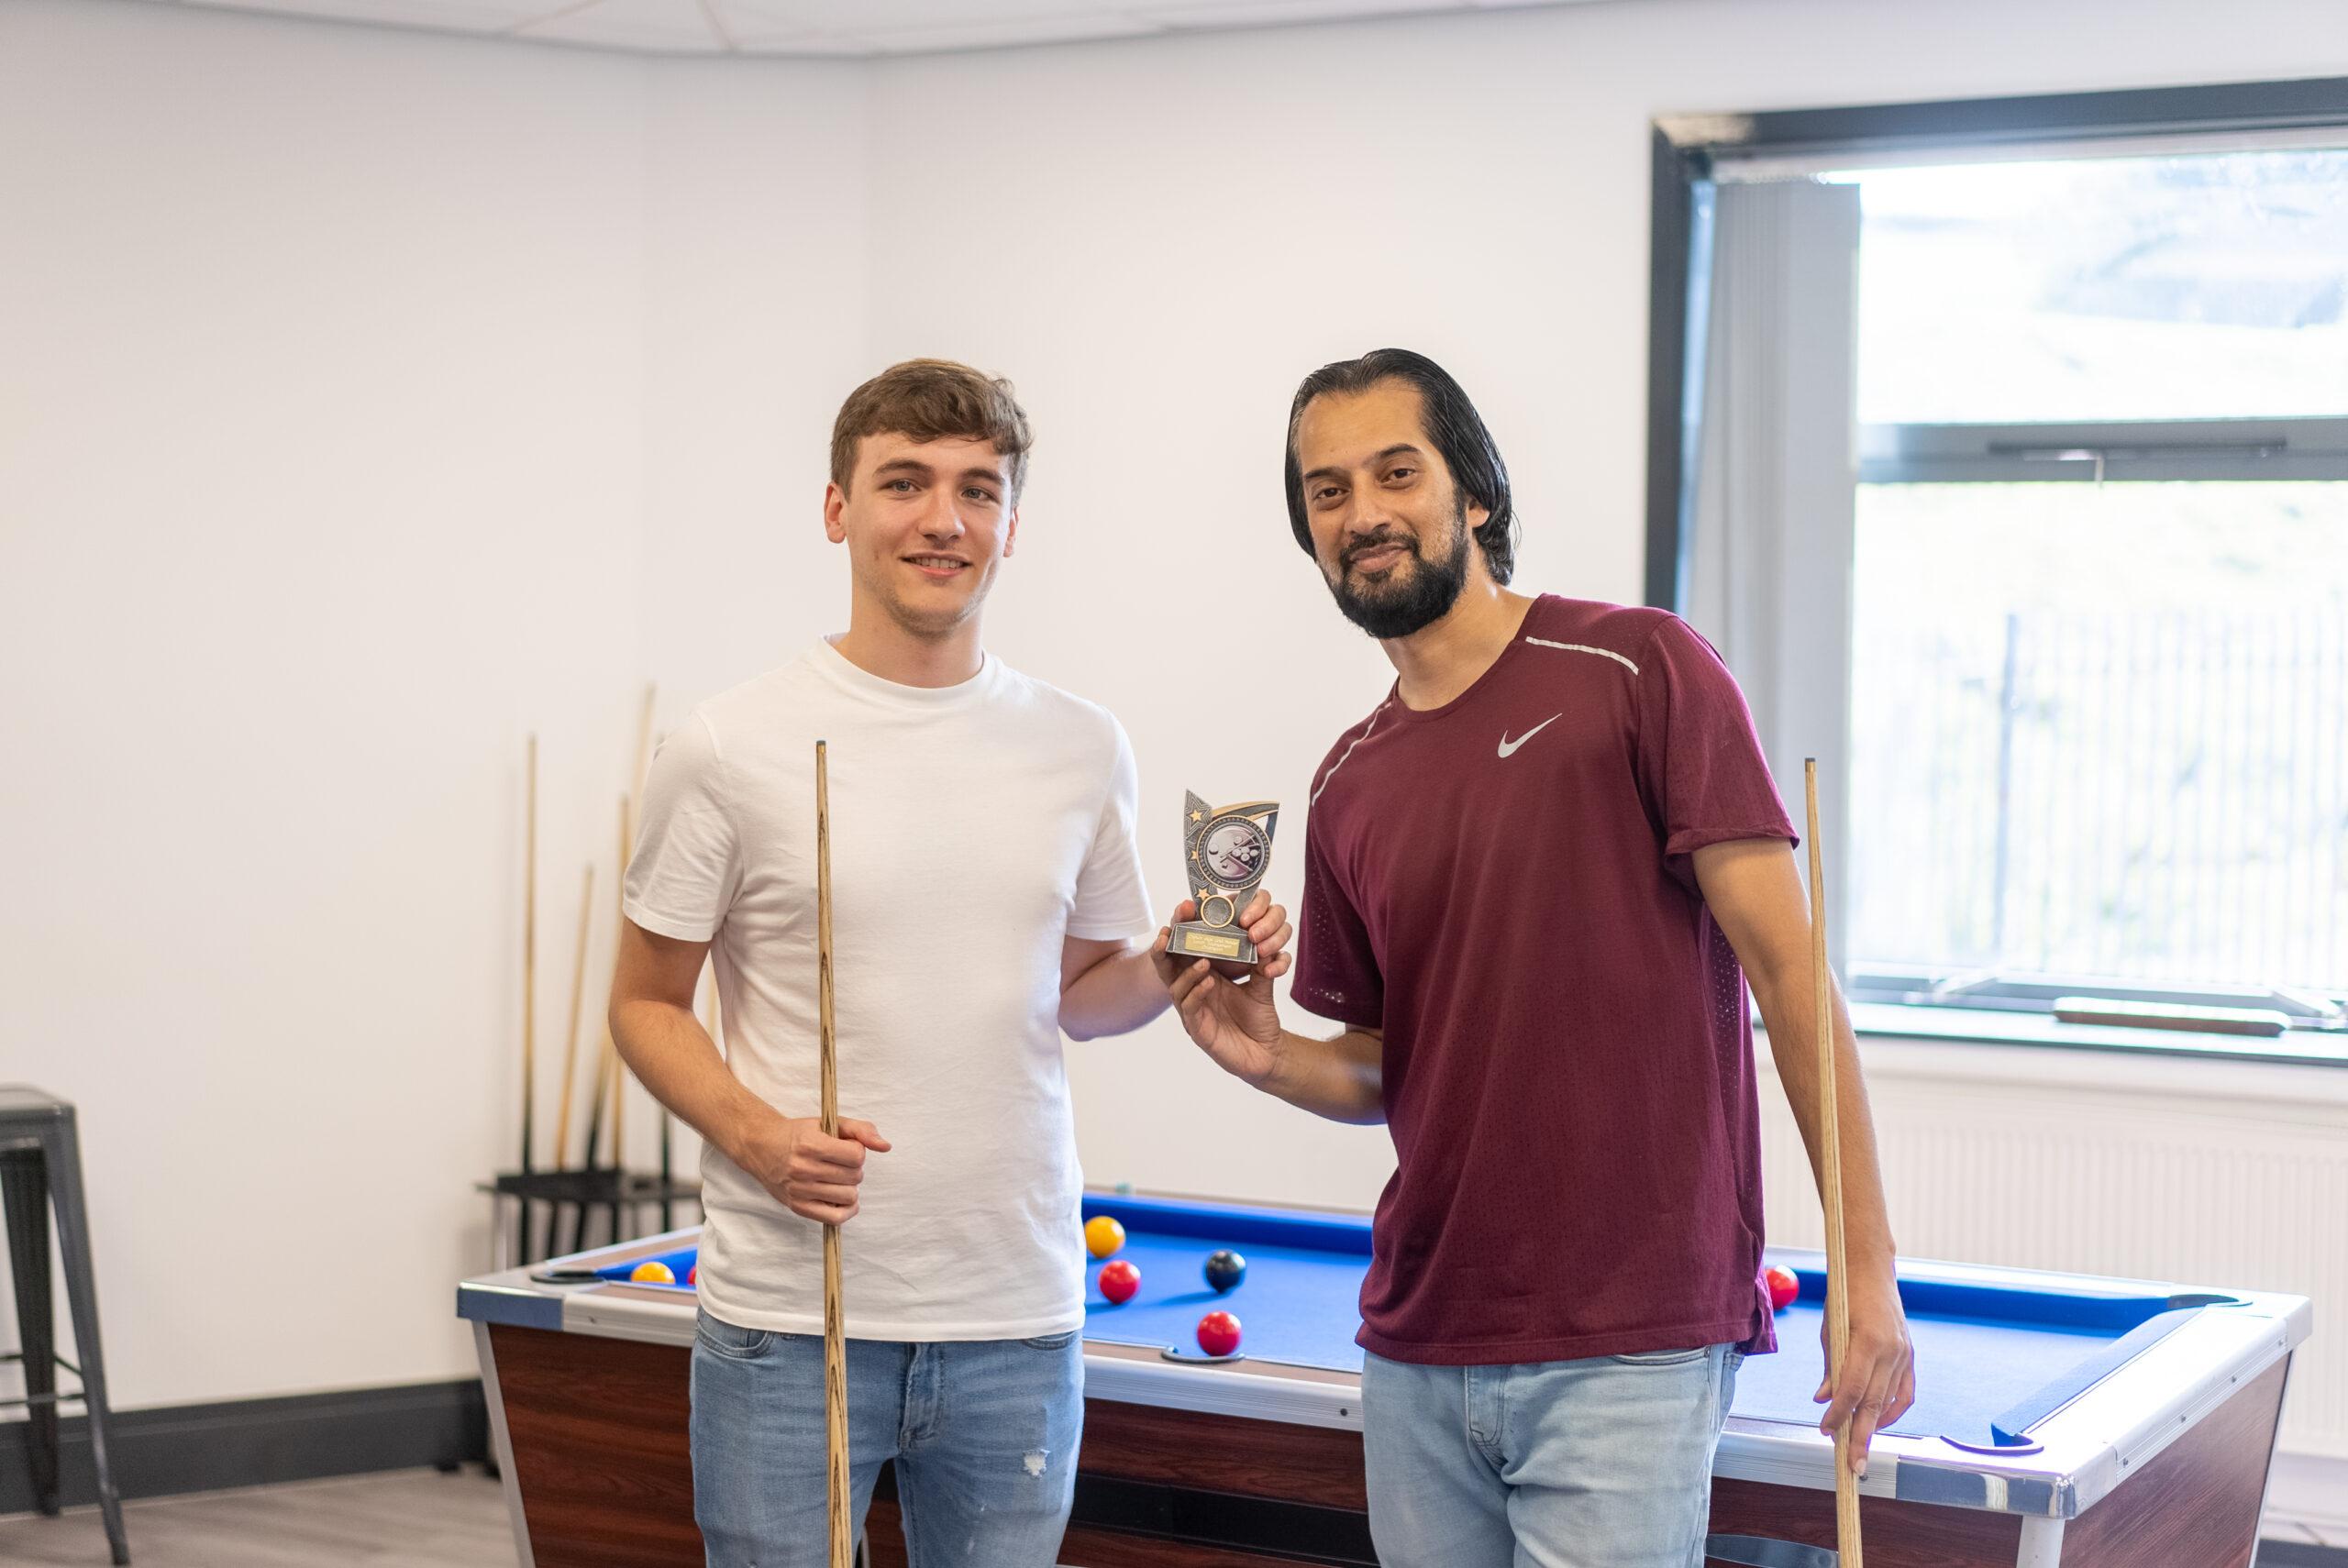 Jack Askham & Ijaz Ali - winners of the Crown Gas & Power charity pool tournament